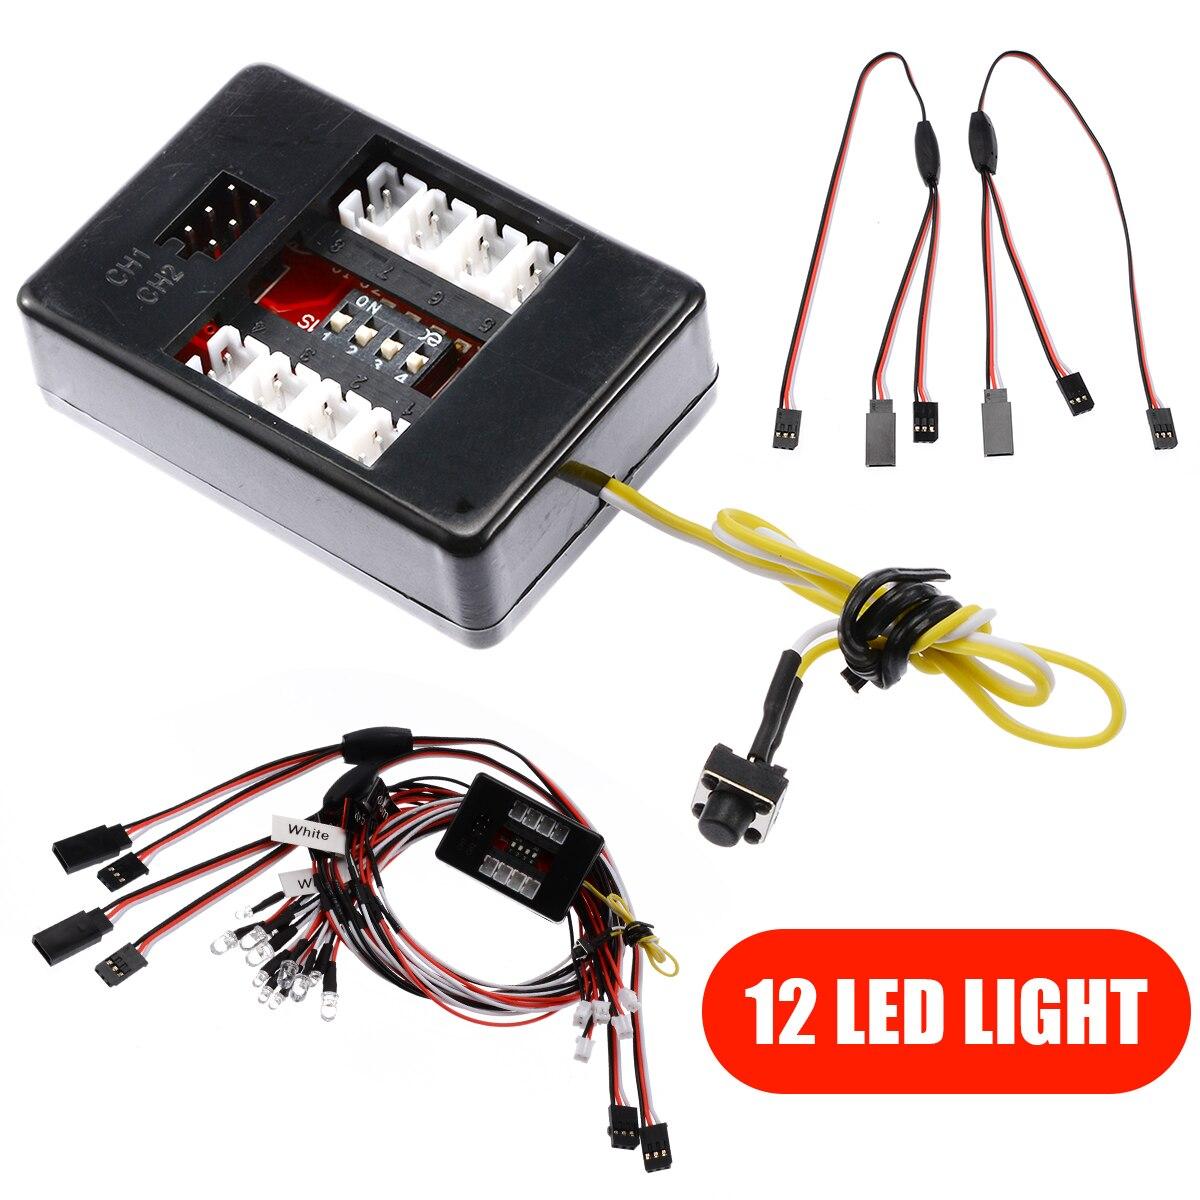 12pcs LED White Light Lighting Kit Simulation Flash Lights RC Car Headlight Taillight For 1/10 RC Car Truck Replace Part enlarge